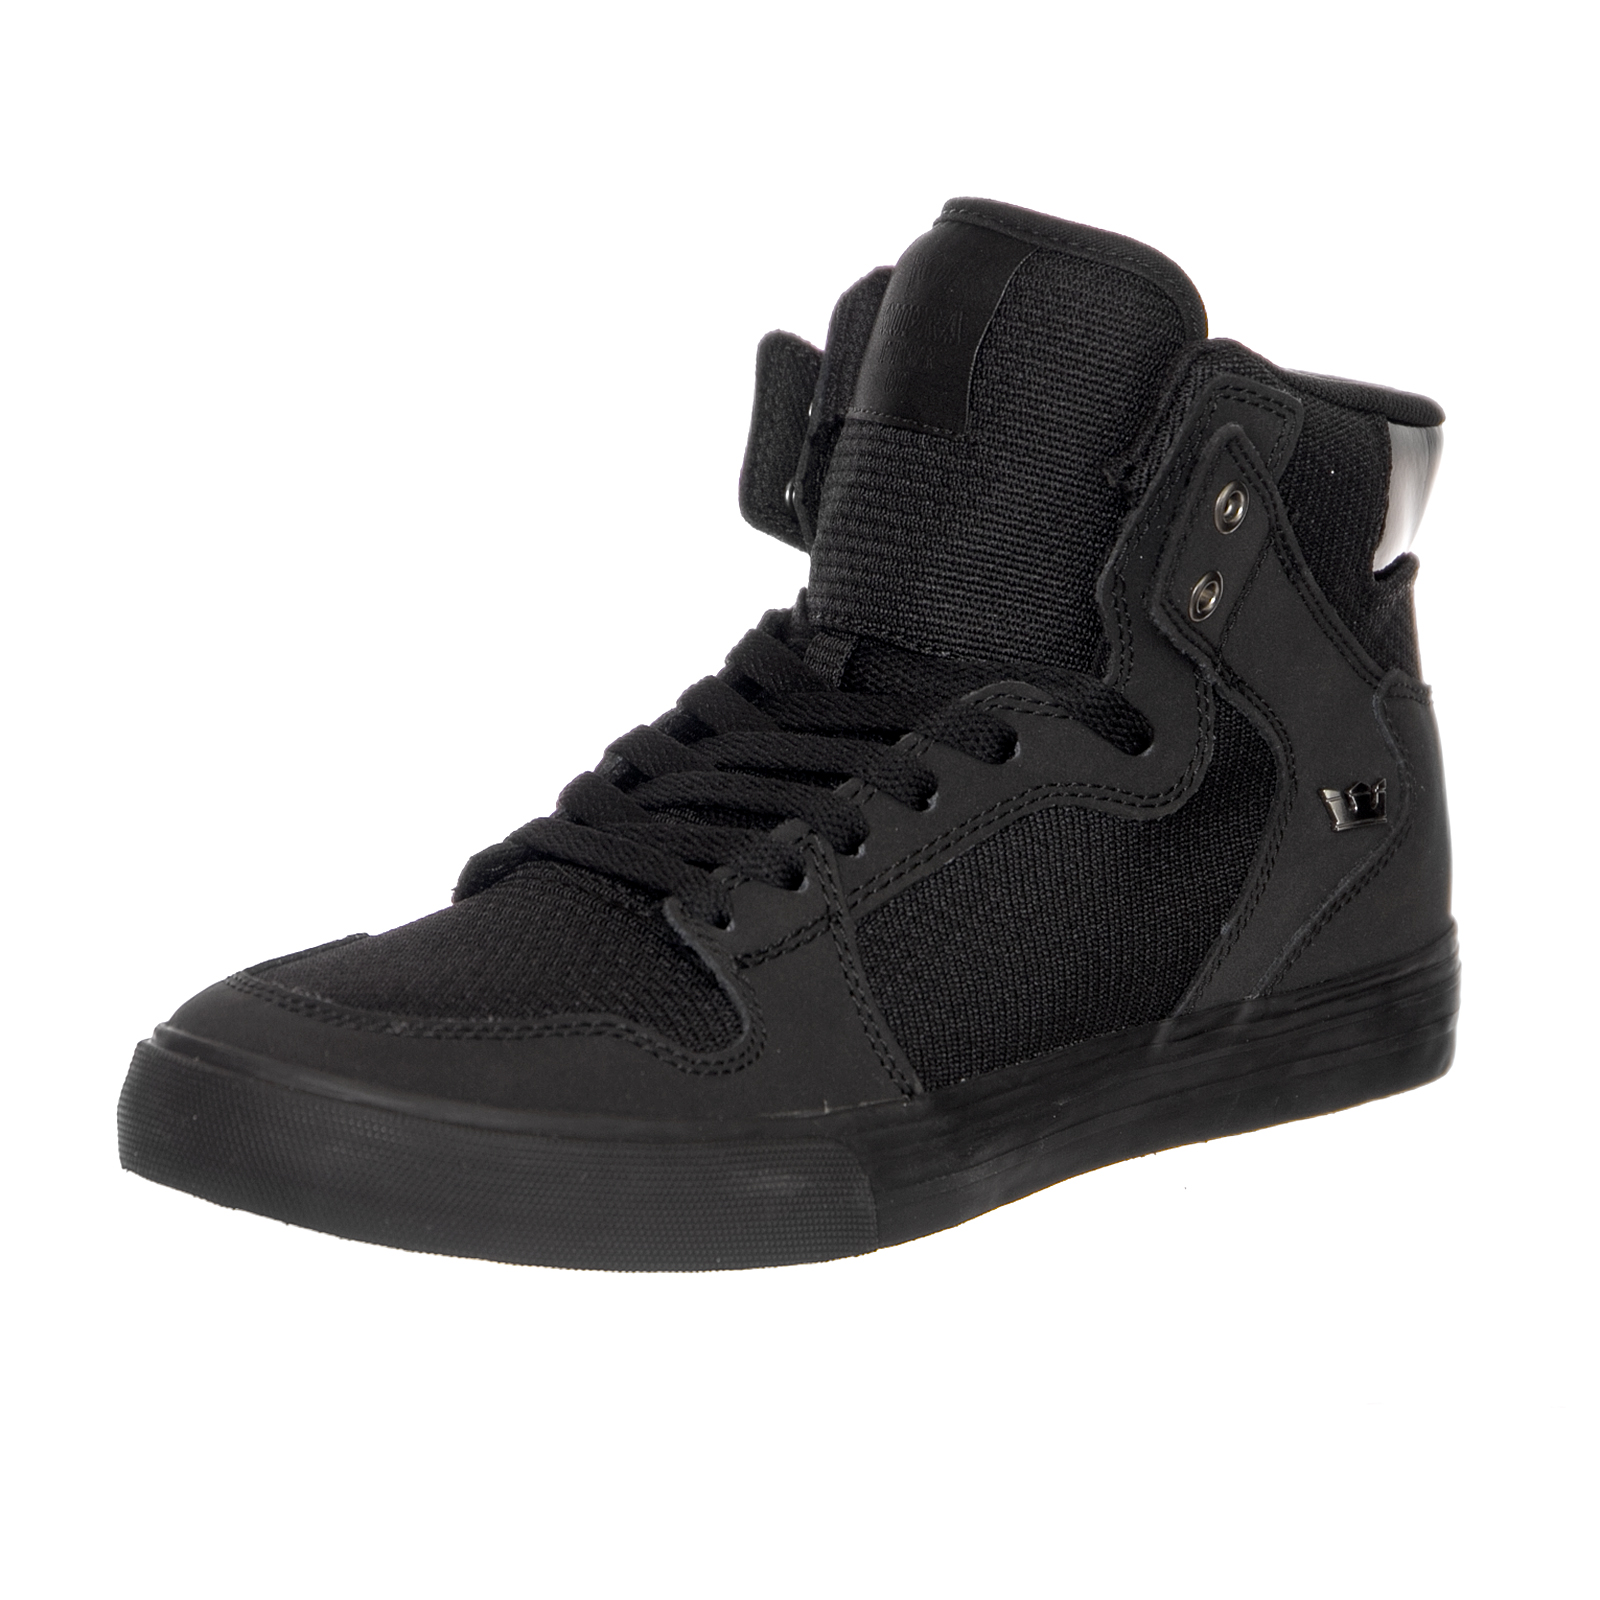 Supra Zapatillas Vaider Negro-Negro Piedra angular negro